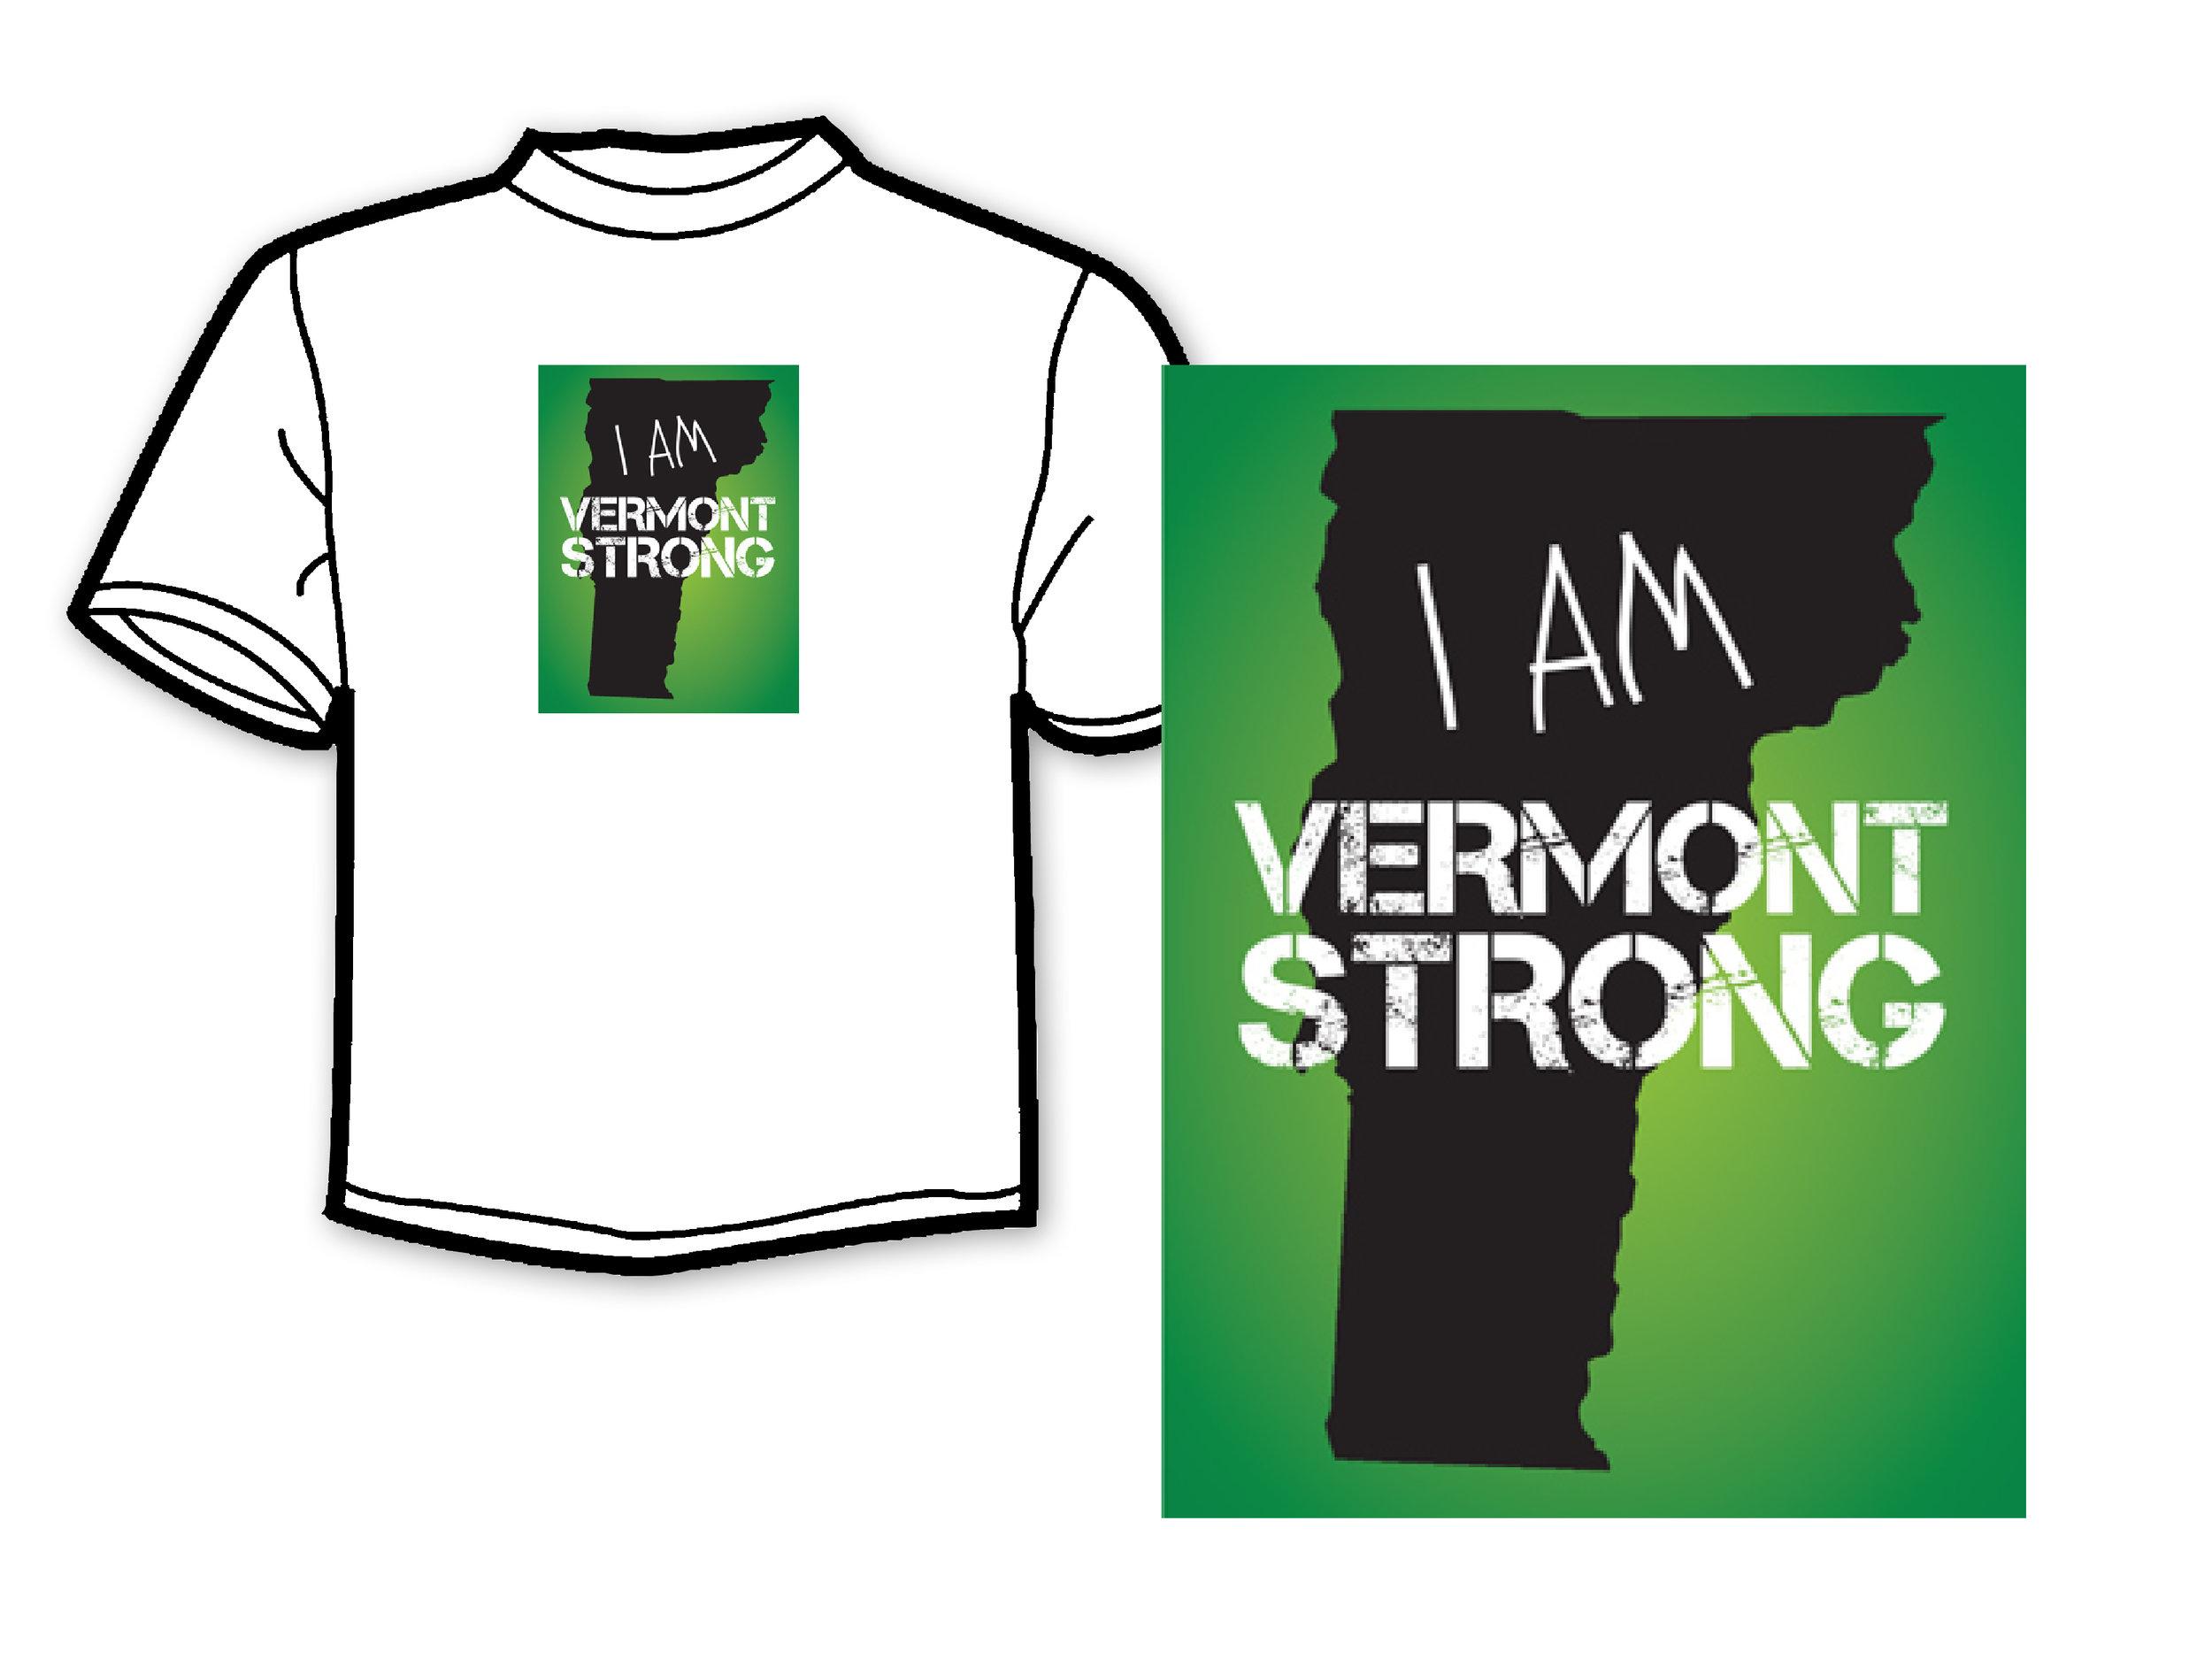 Fundraiser Campaign Logo & T-shirt